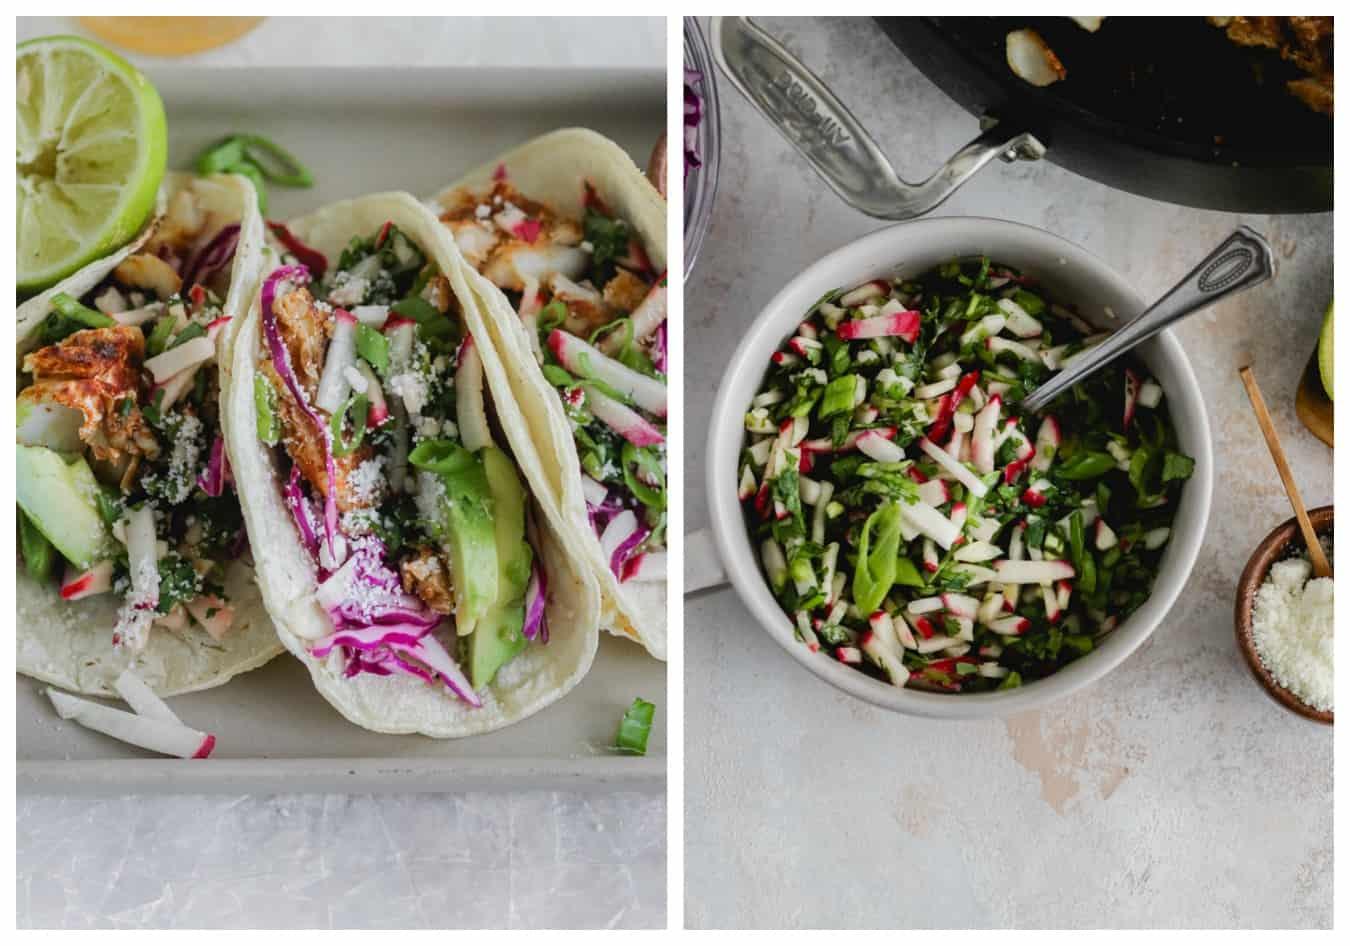 Fish Tacos with Cilantro-Radish Salsa